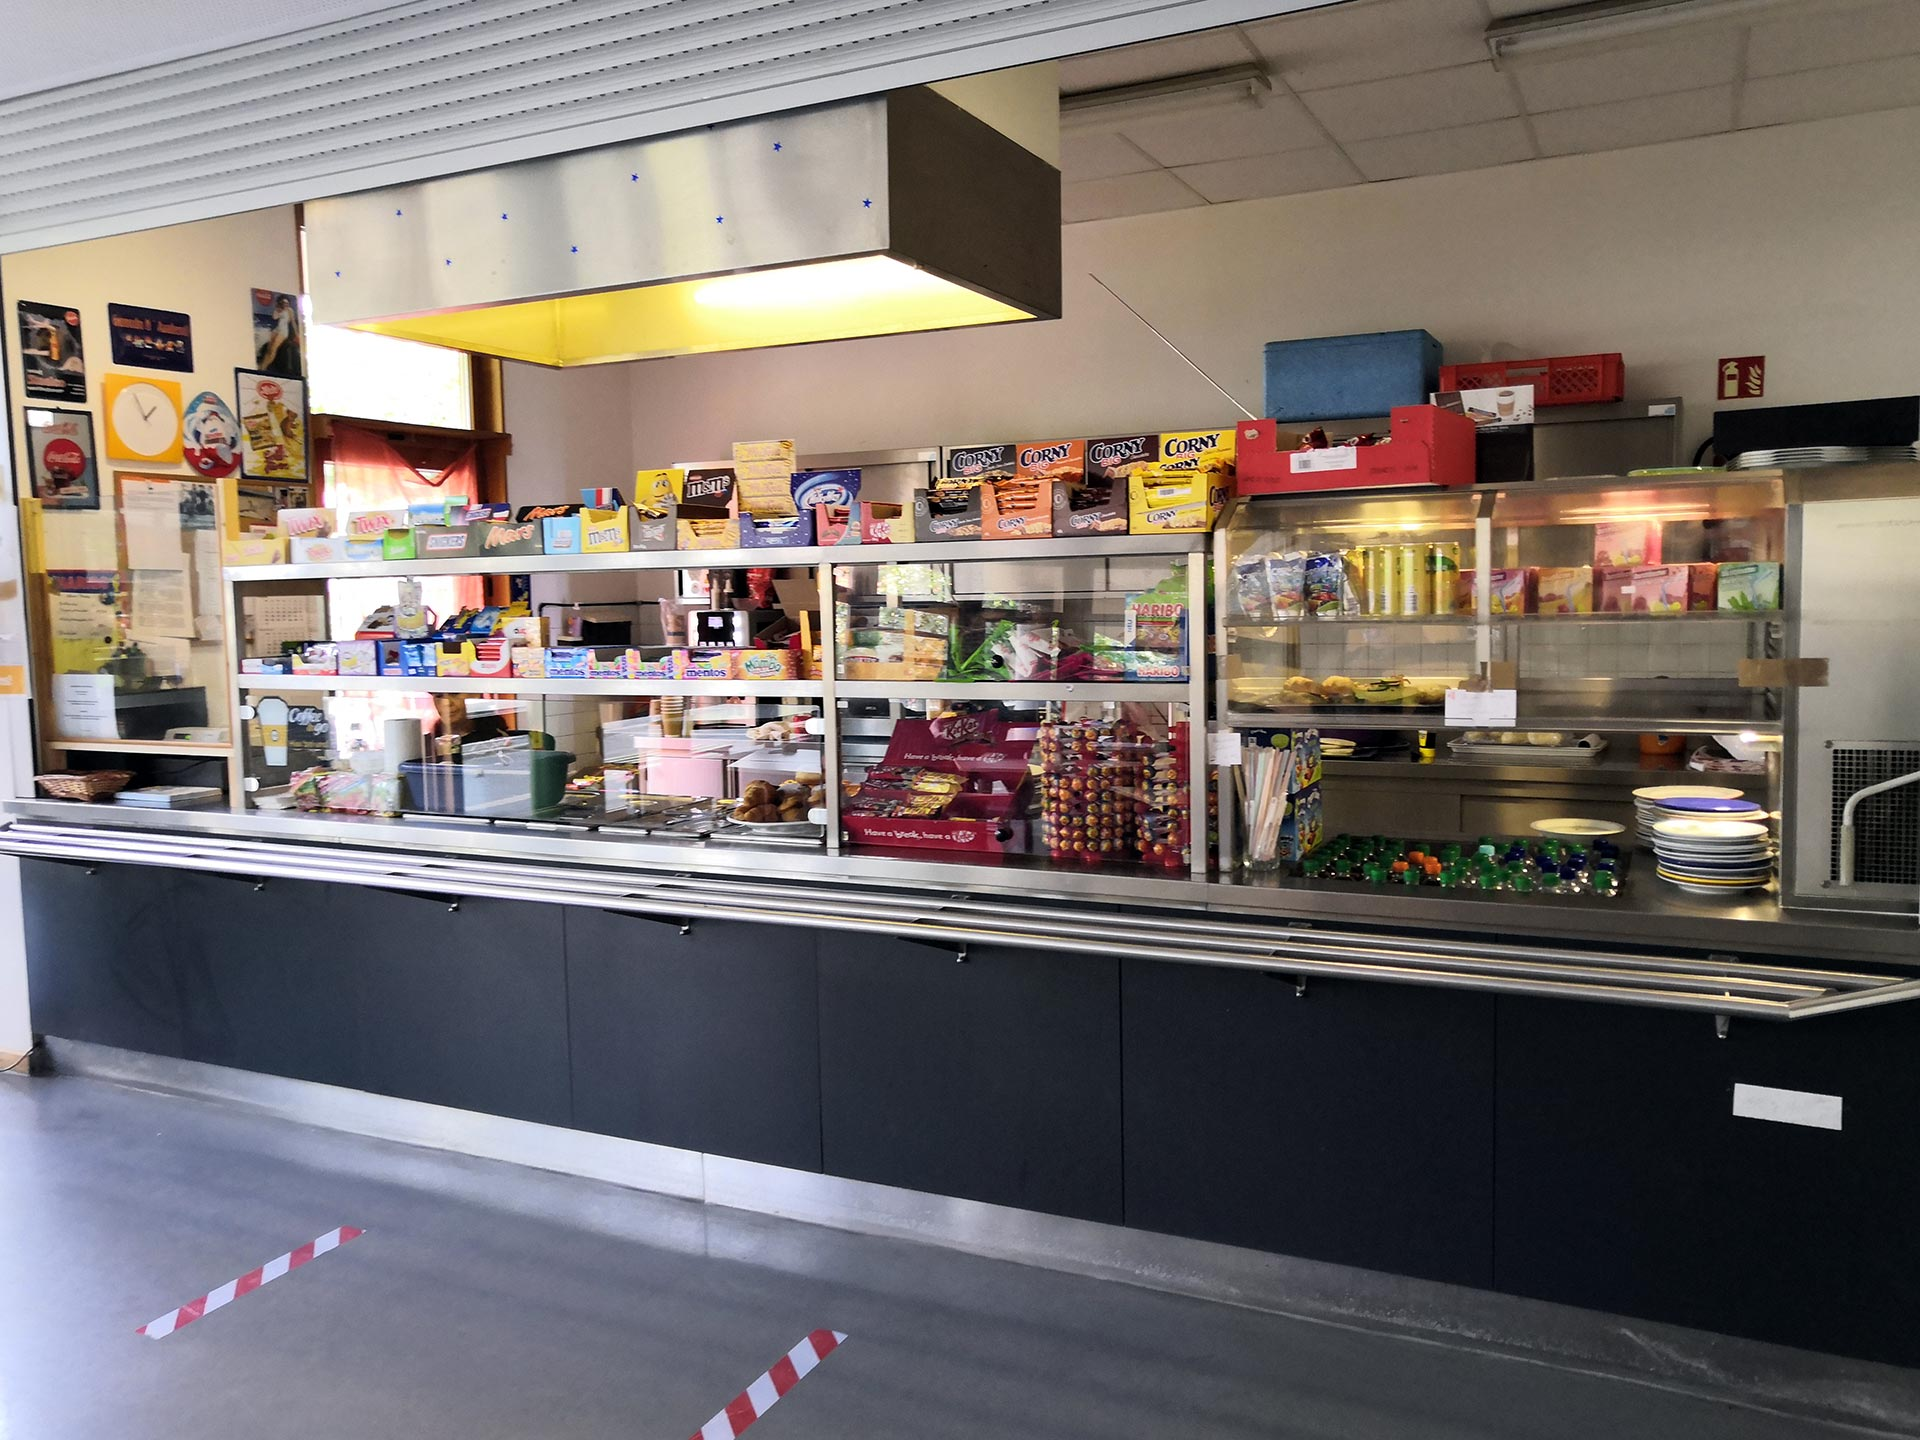 Cafeteria im Hedwig Bollhagen Gymnasium